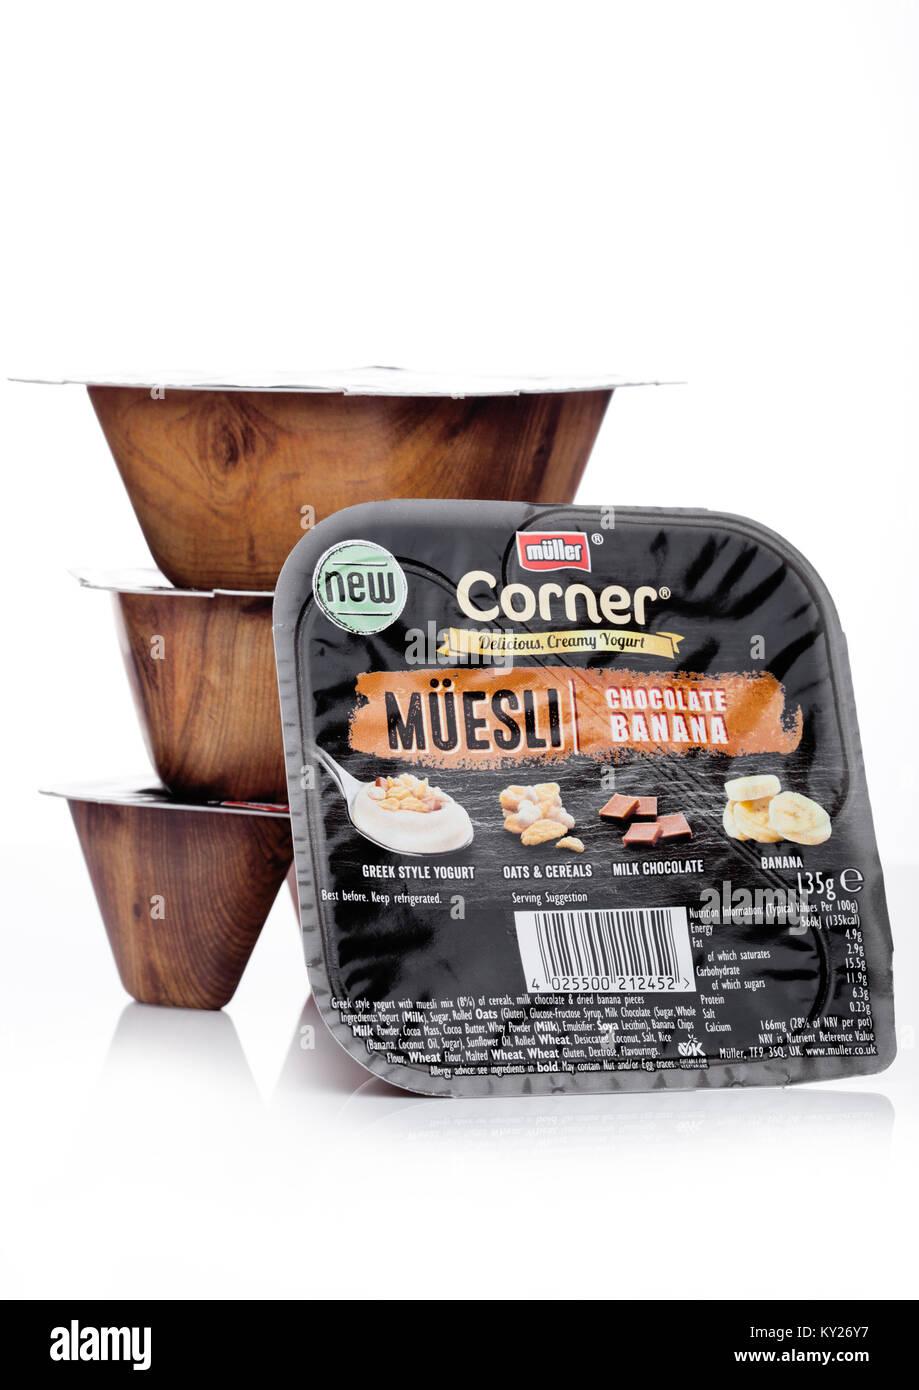 LONDON, UK - JANUARY 02, 2018:  Muller corner yogurt with muesli and chocolate on a white background. - Stock Image